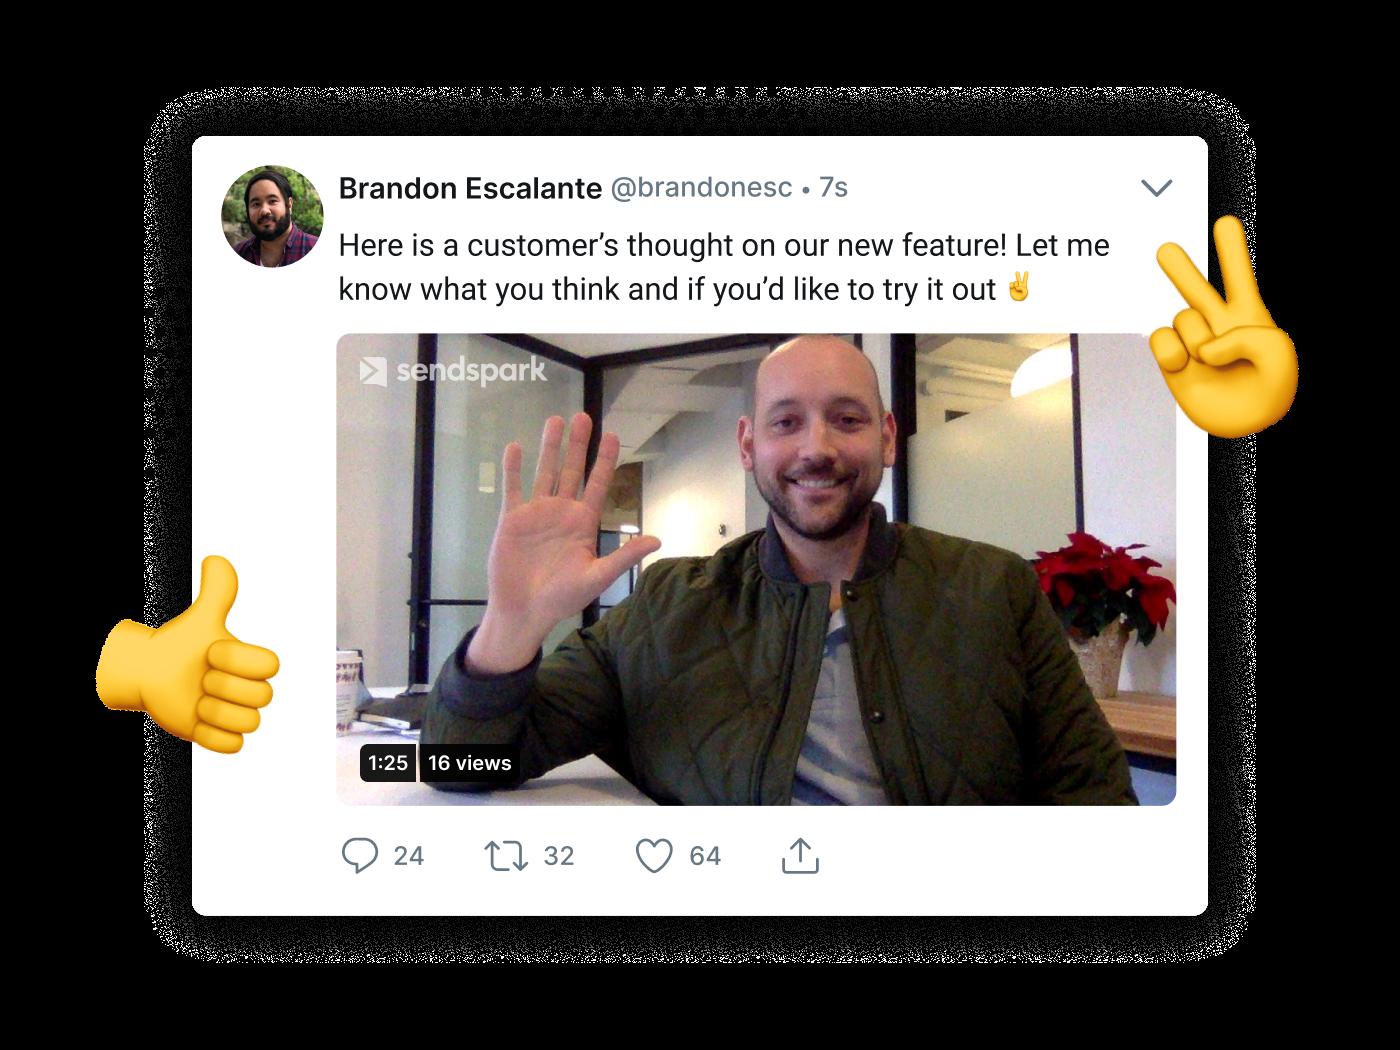 Share Videos in LinkedIn